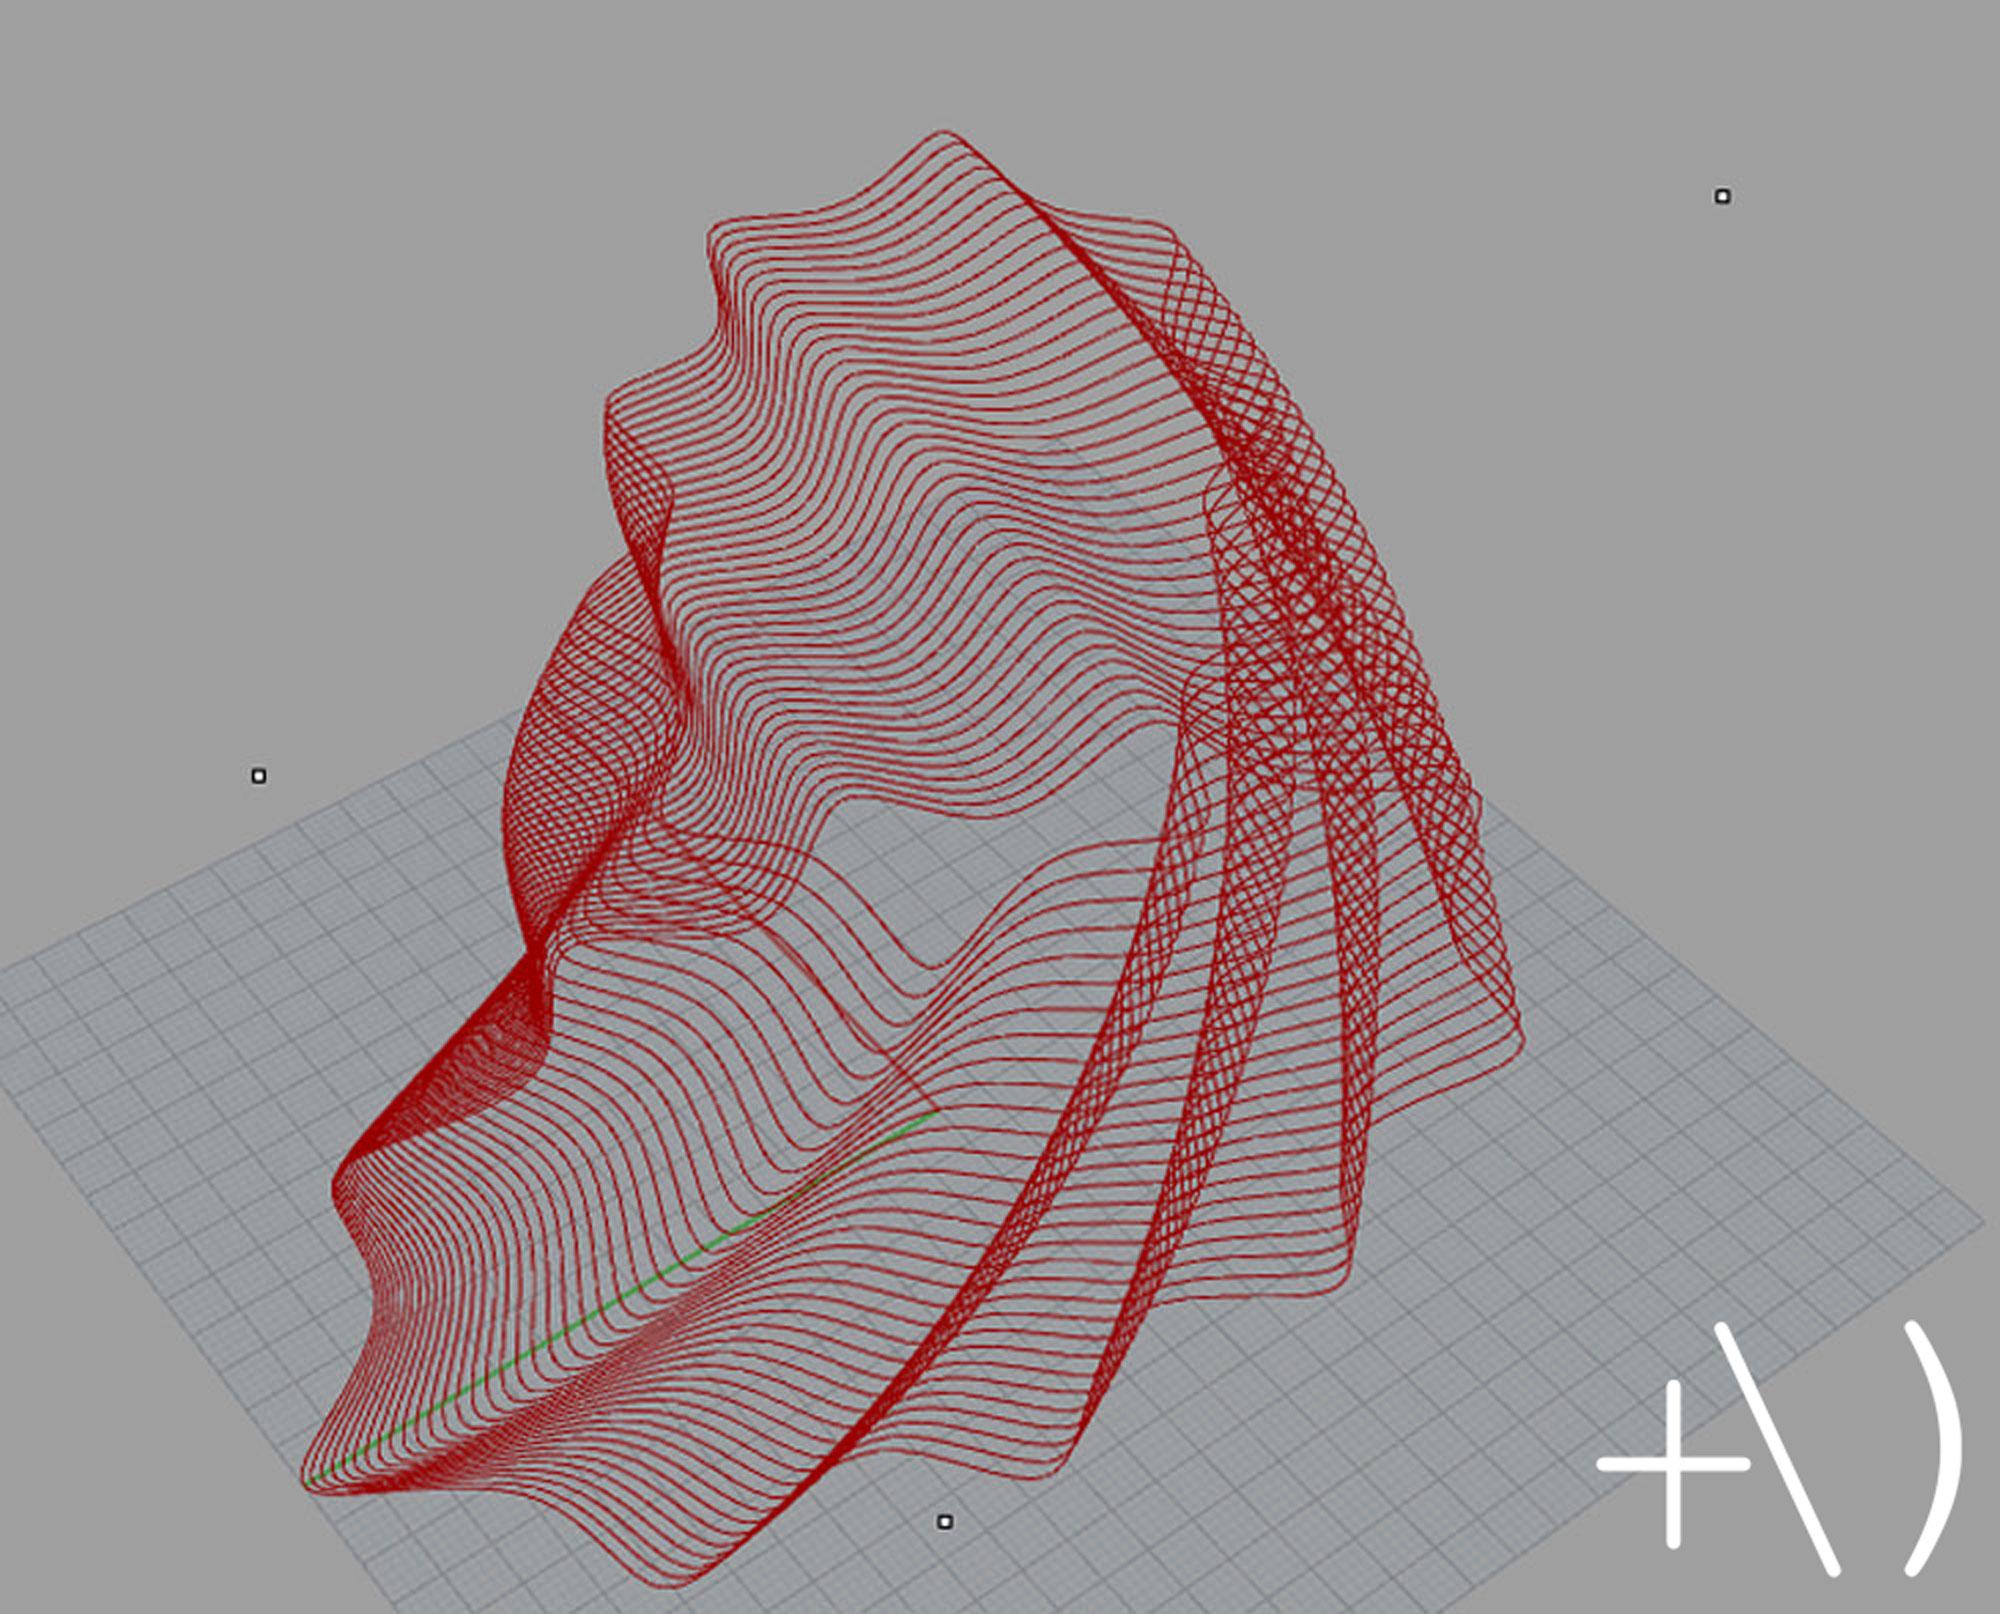 computational clay design torsione wireframe rhino